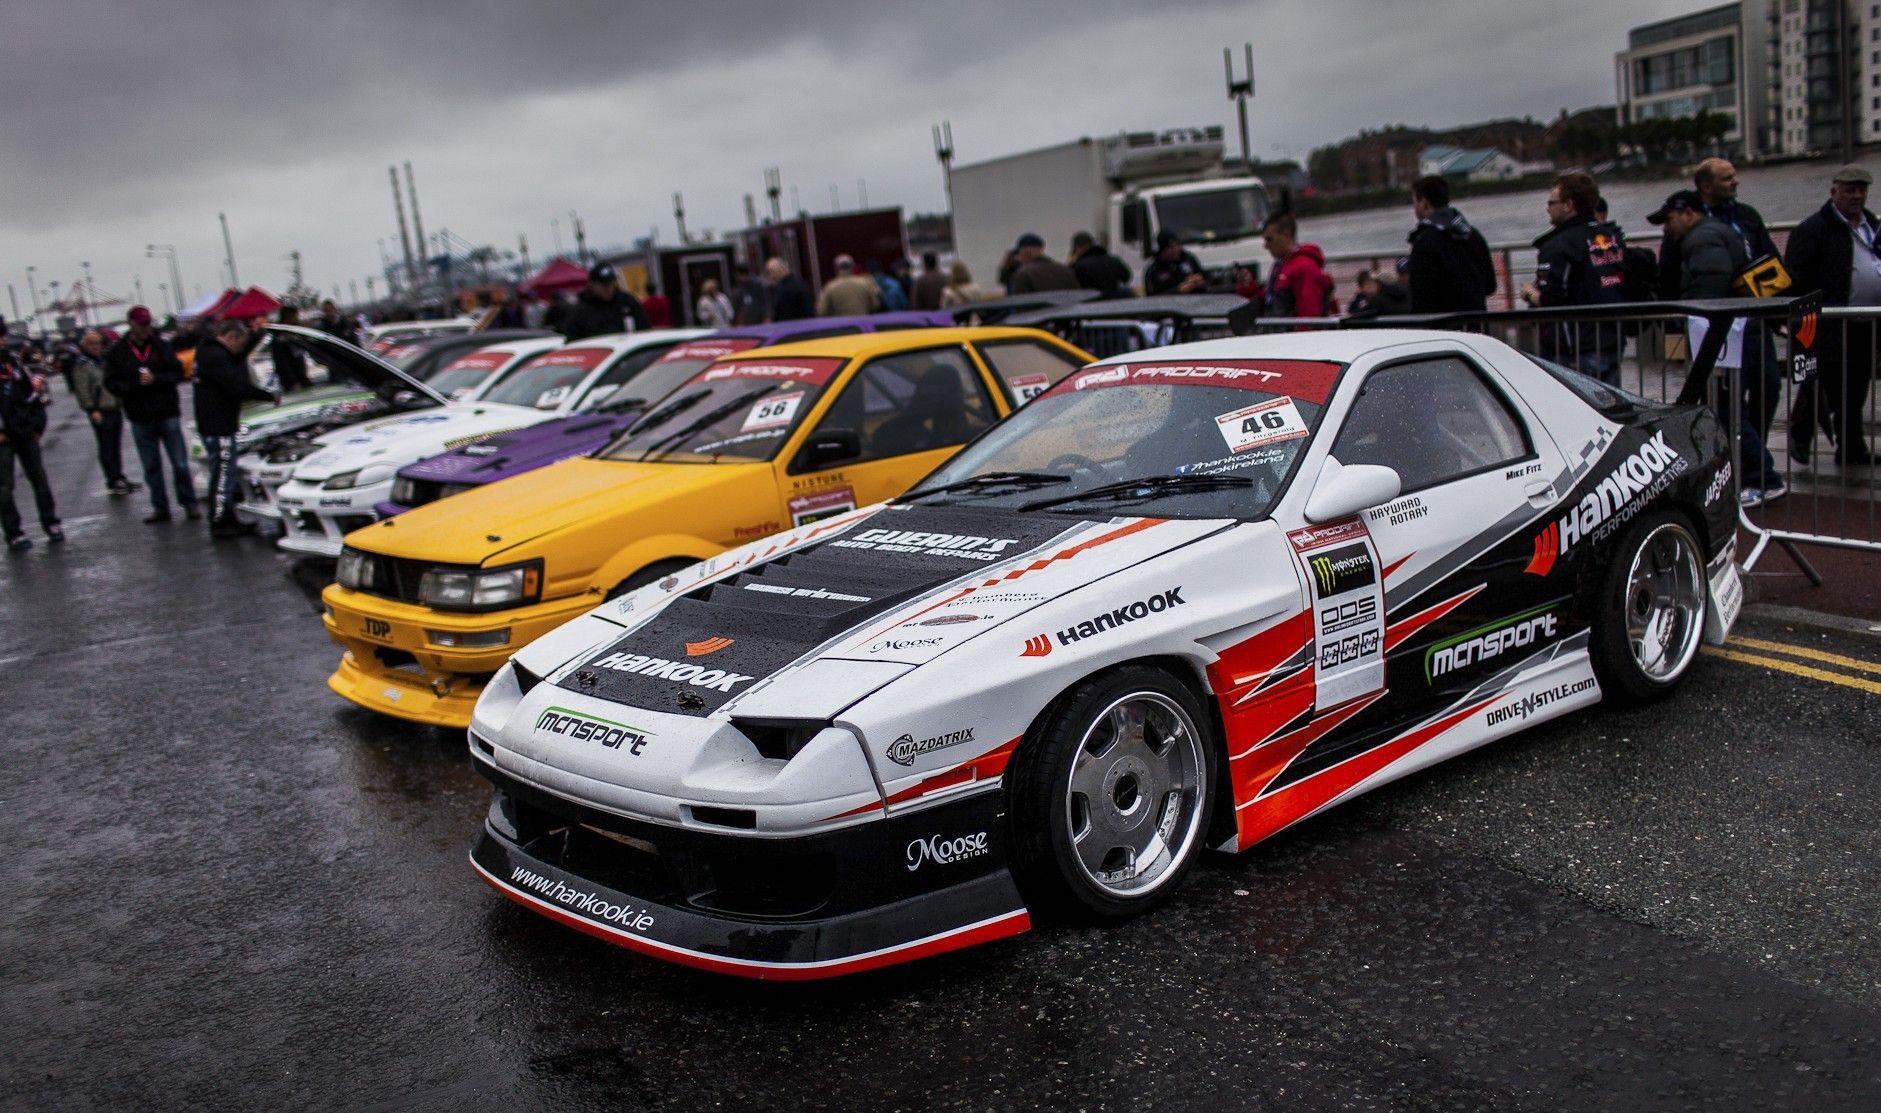 Mazda Racing Cars Road Race - CarFoy | my stuff | Pinterest ...